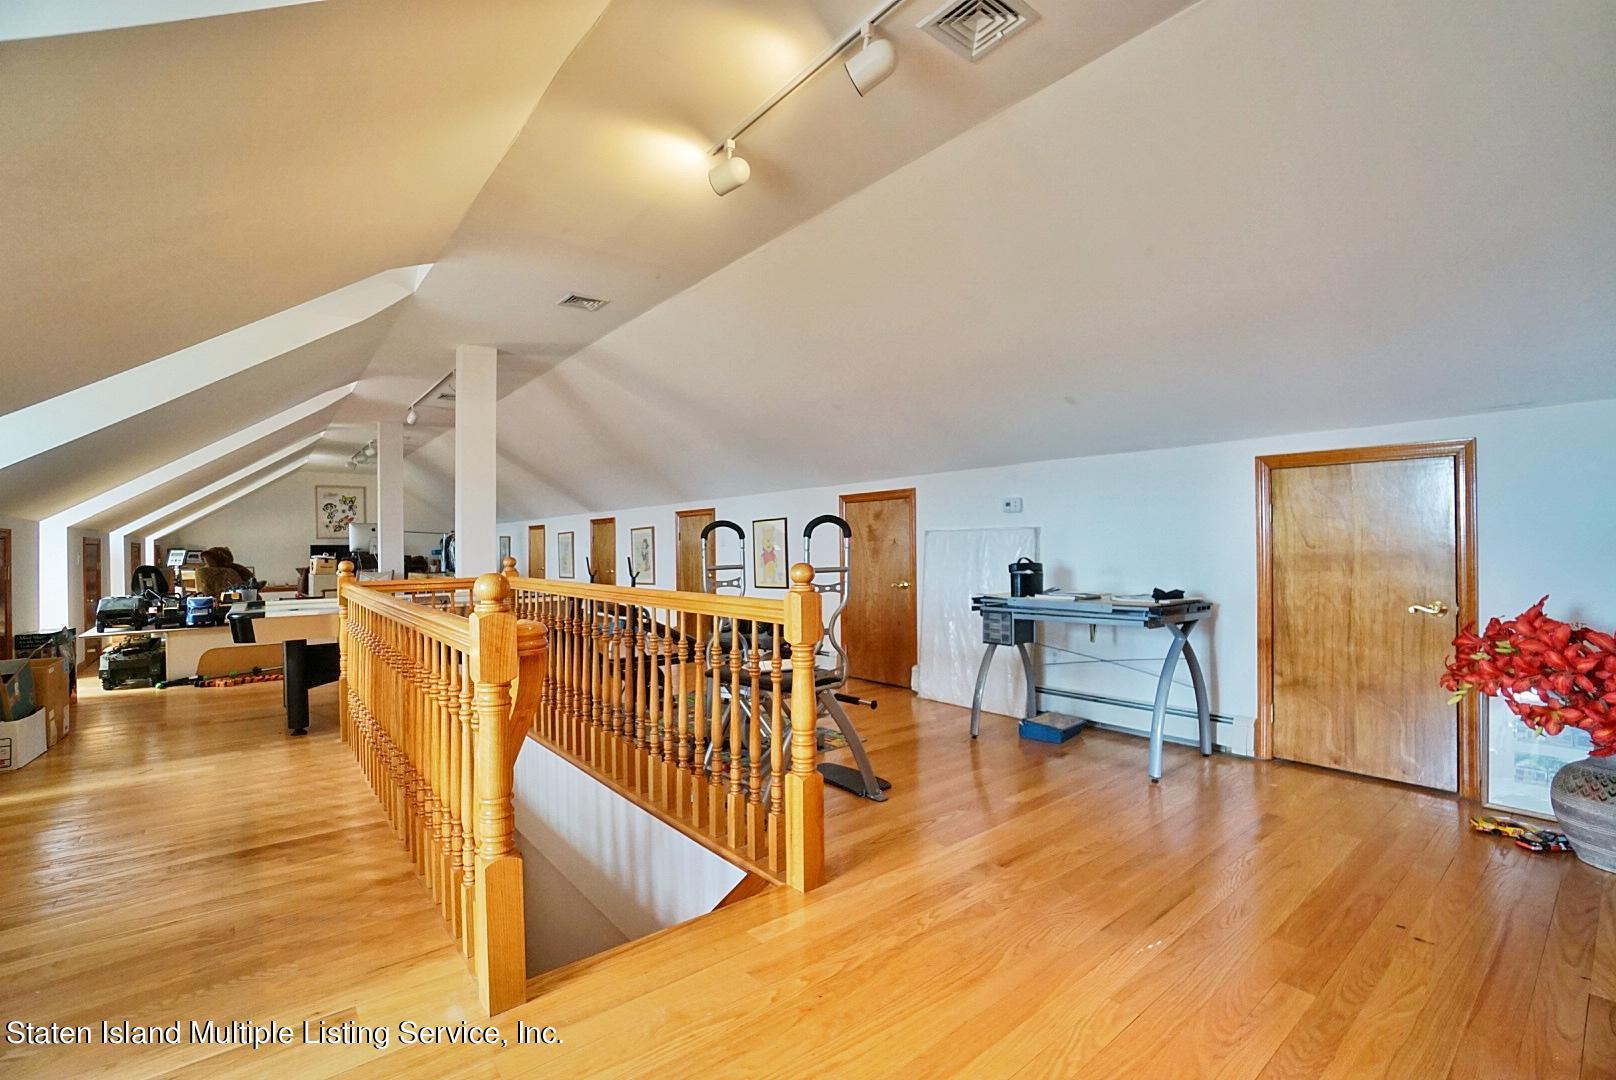 Single Family - Detached 129 Coverly Avenue   Staten Island, NY 10301, MLS-1144490-45